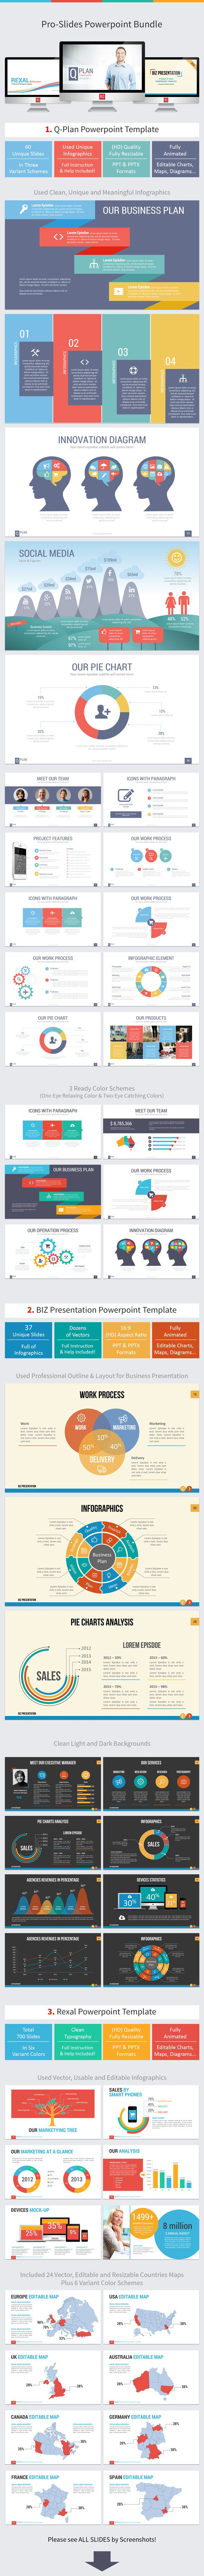 Pro-Slides Powerpoint Bundle (PowerPoint Templates) Main Live Preview #Powerpoint #Powerpoint_Template #Presentation